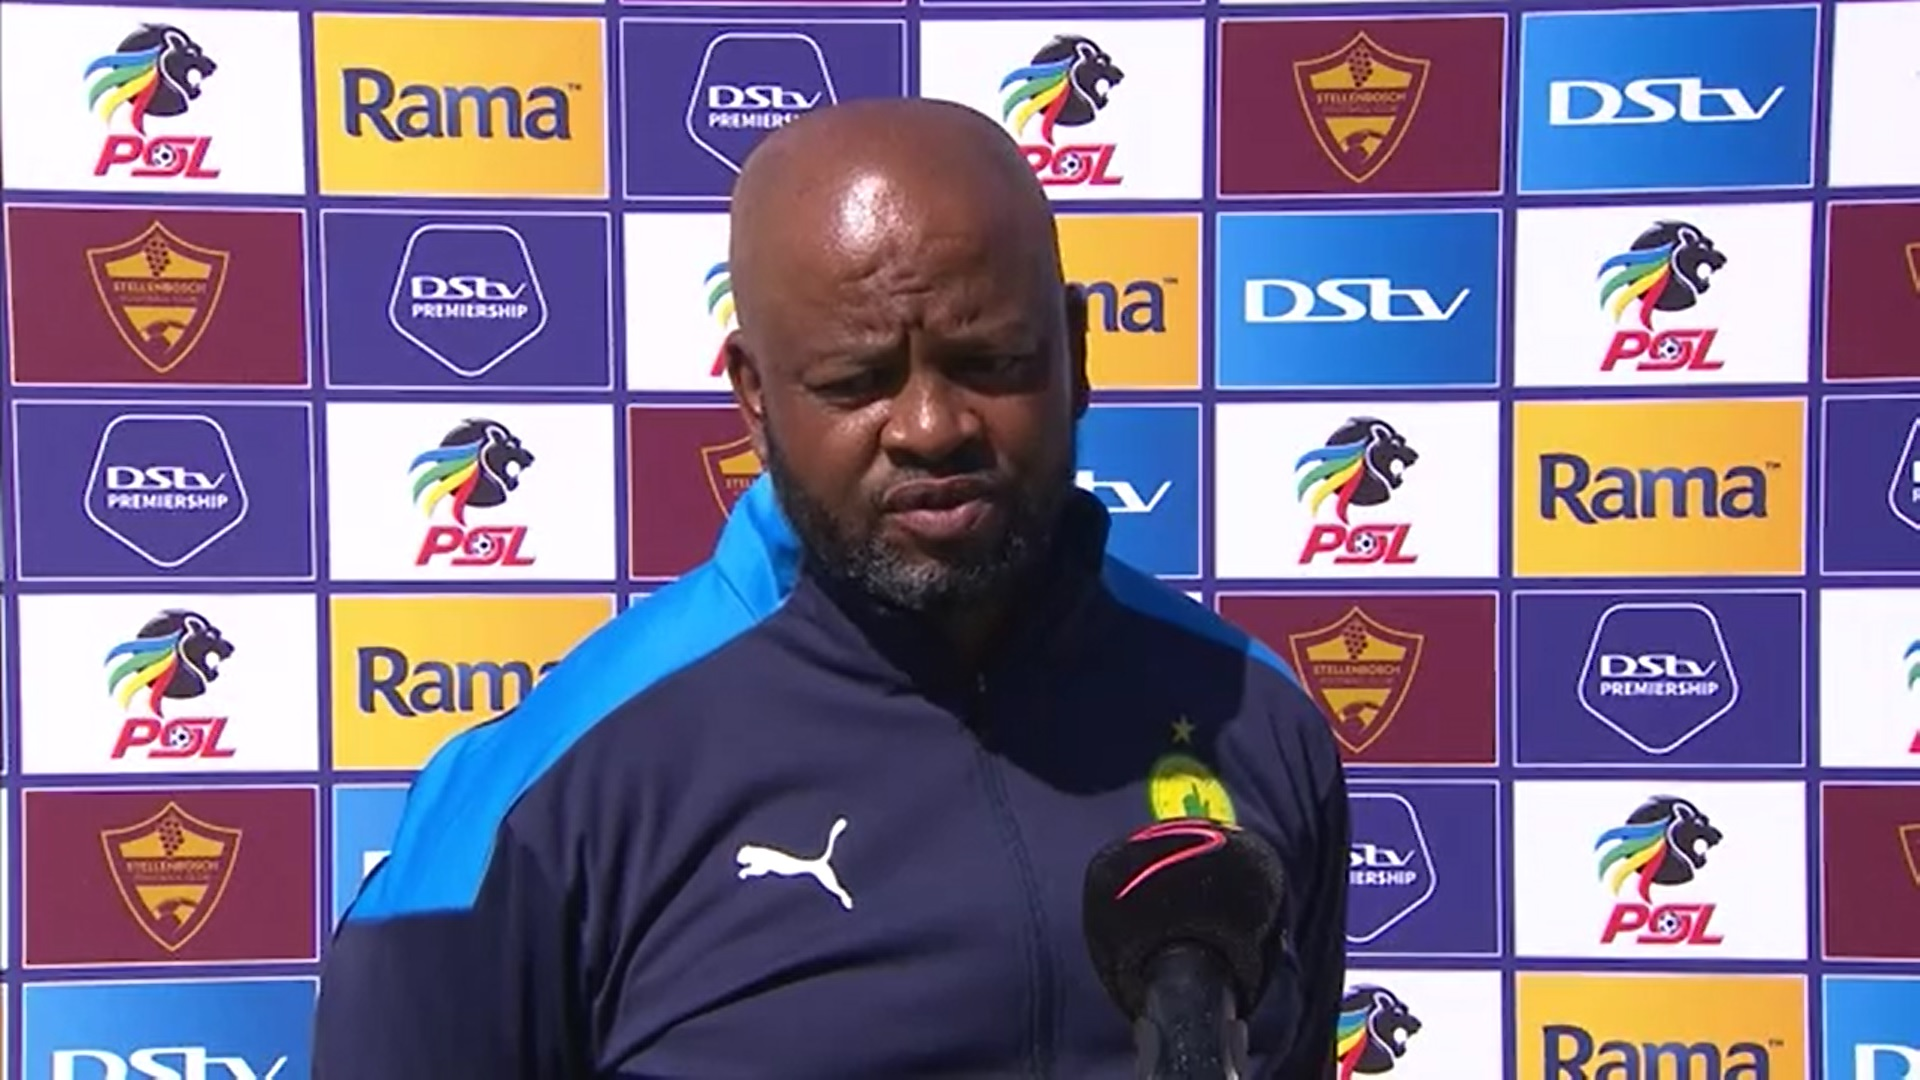 DStv Premiership | Stellenbosch FC v Mamelodi Sundowns | Post-match interview with Manqoba Mngqithi